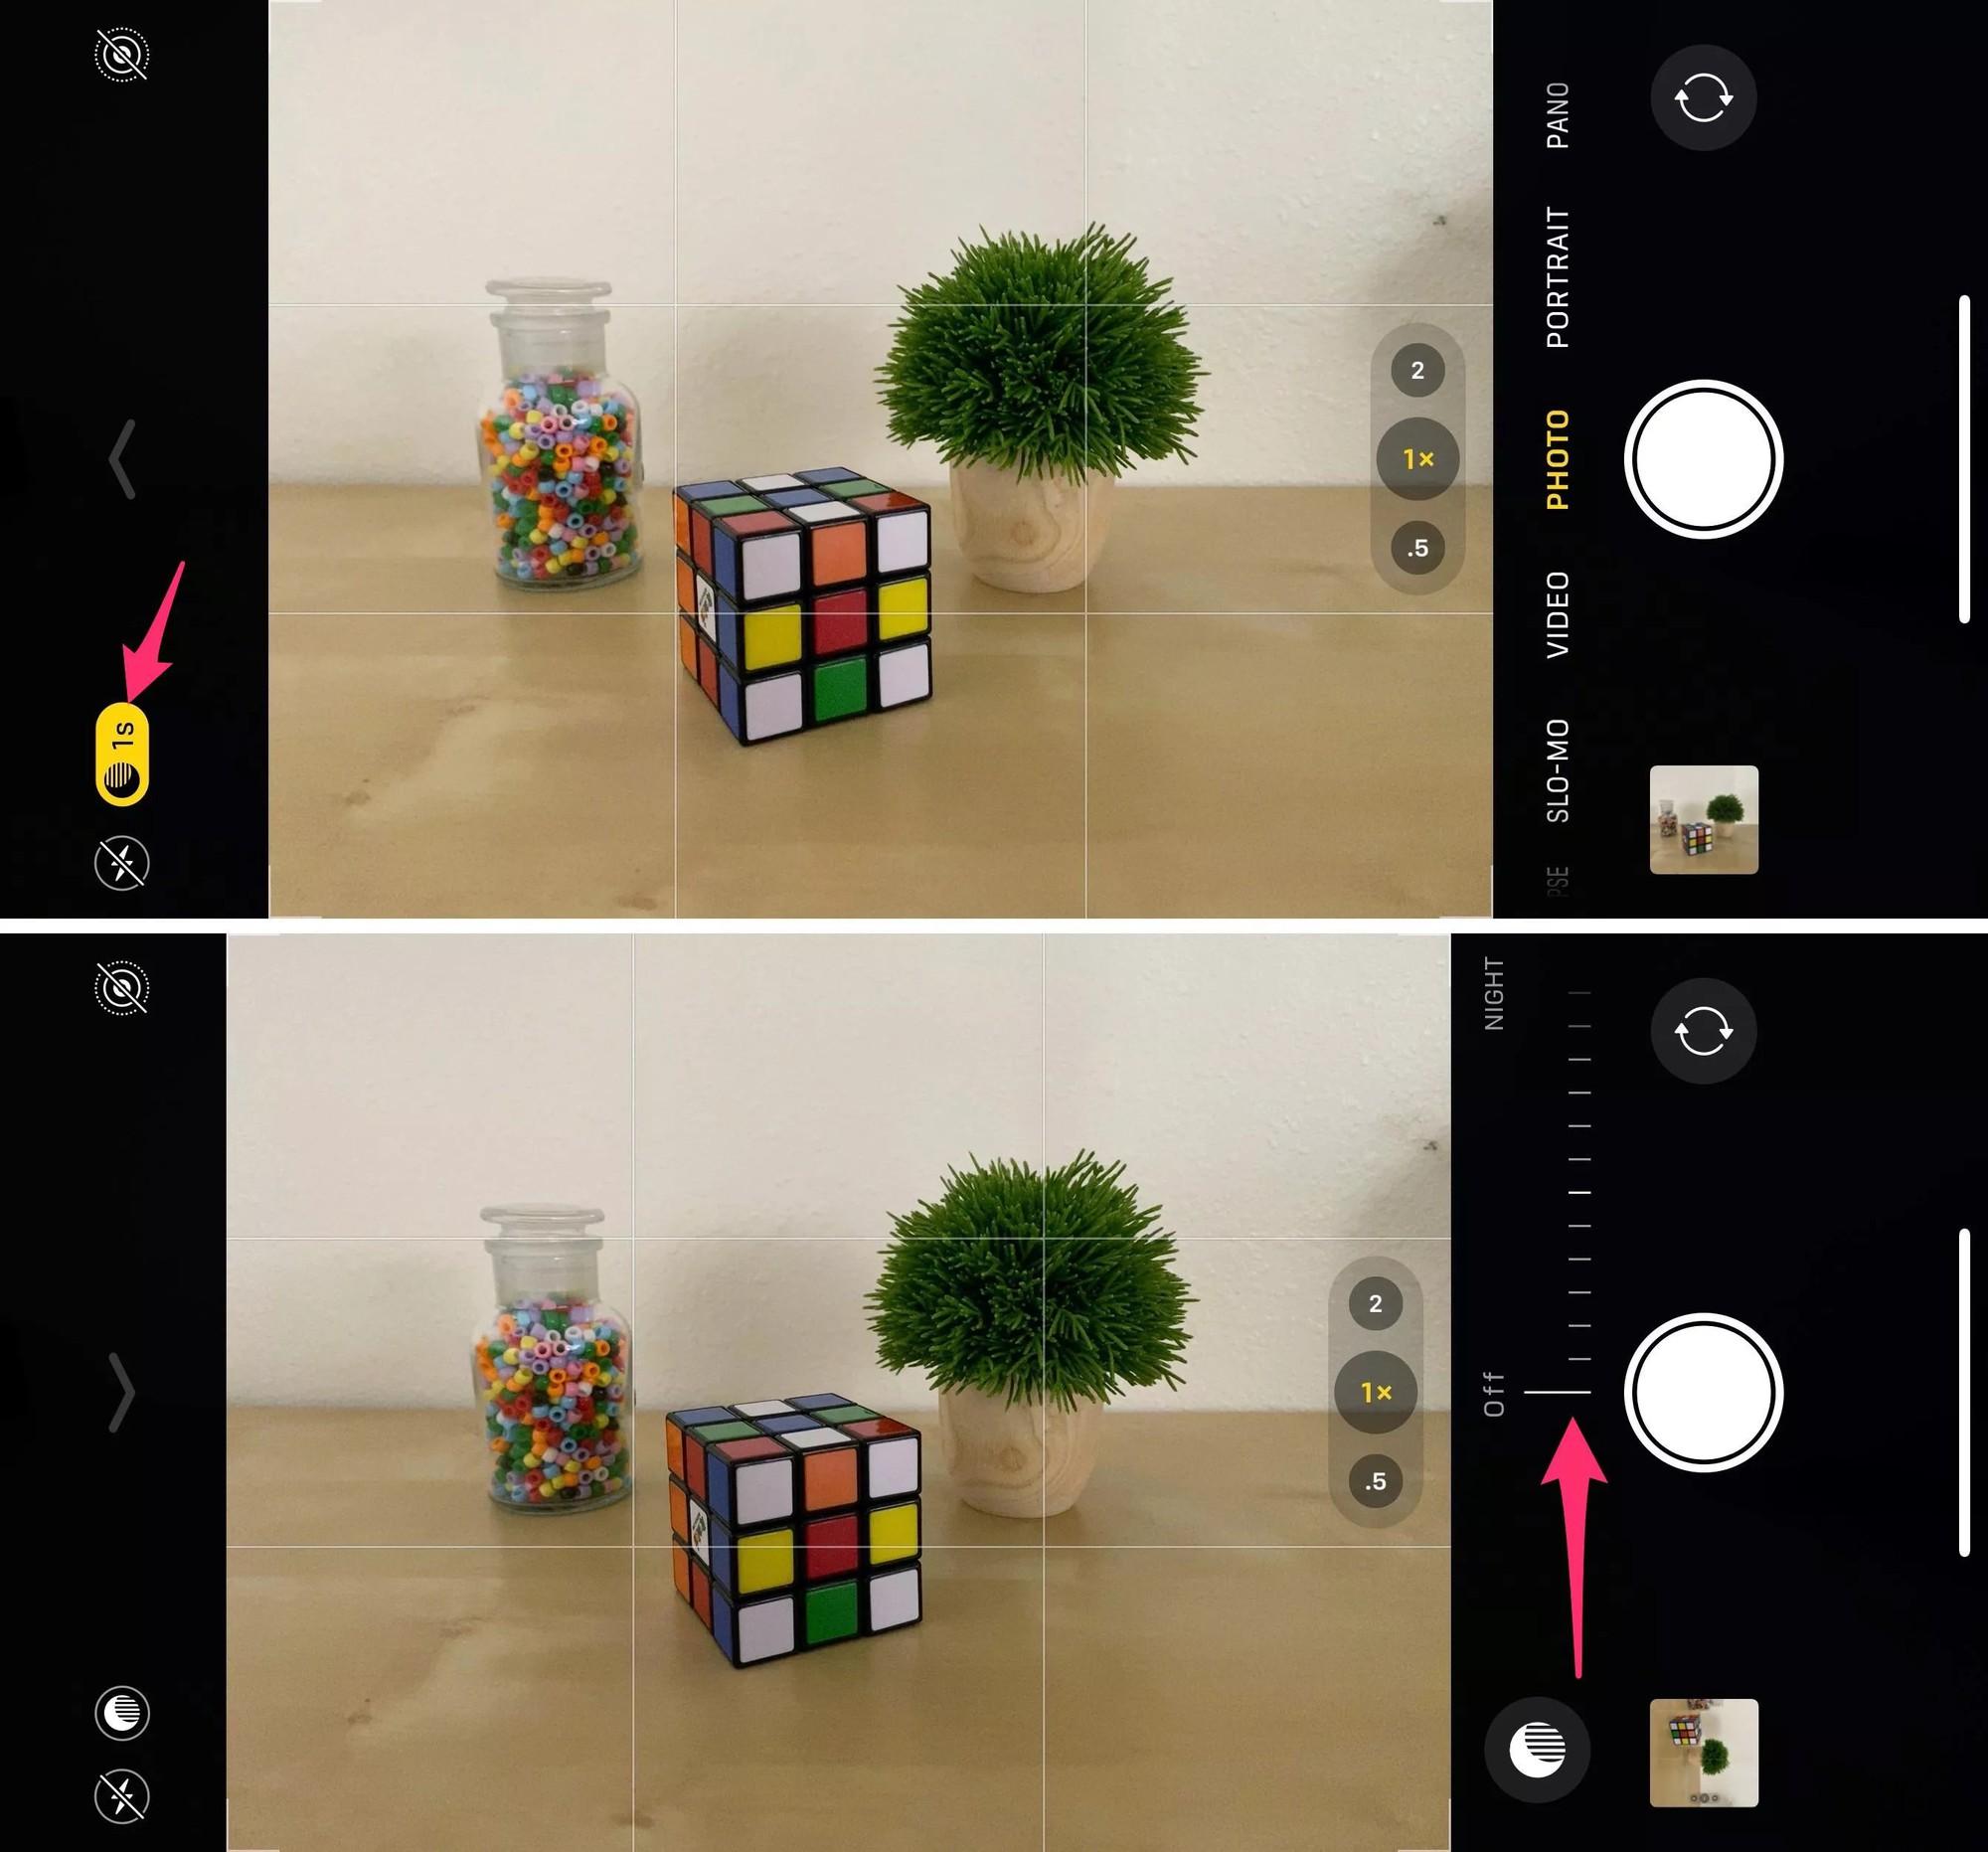 lam-chu-camera-iphone-11-nhung-dieu-can-biet-de-chup-anh-dep-hon-3